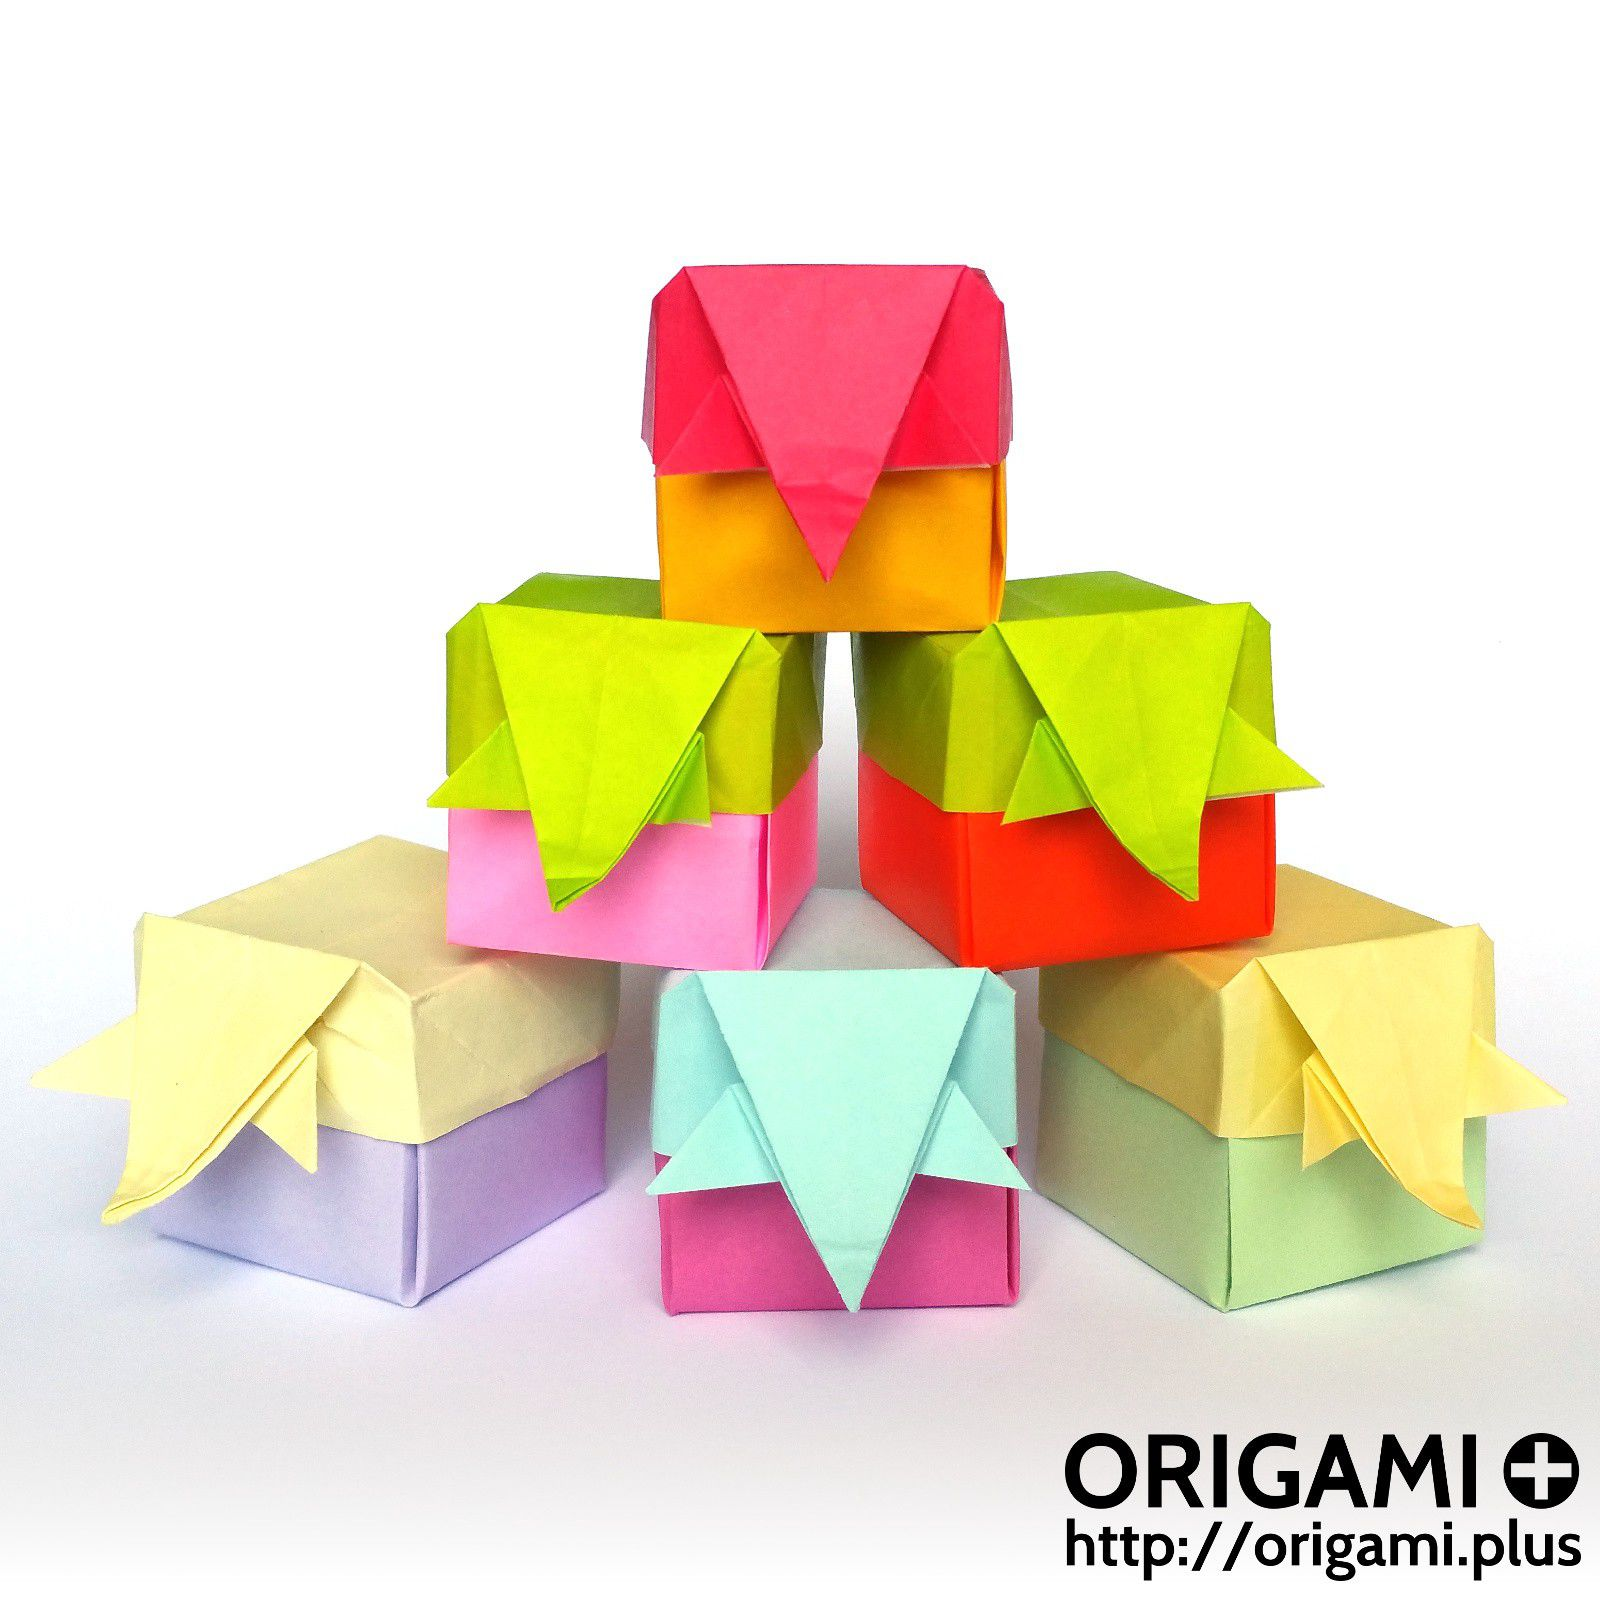 Origami elephant box i cant stop making more and more of those origami elephant boxes jeuxipadfo Choice Image